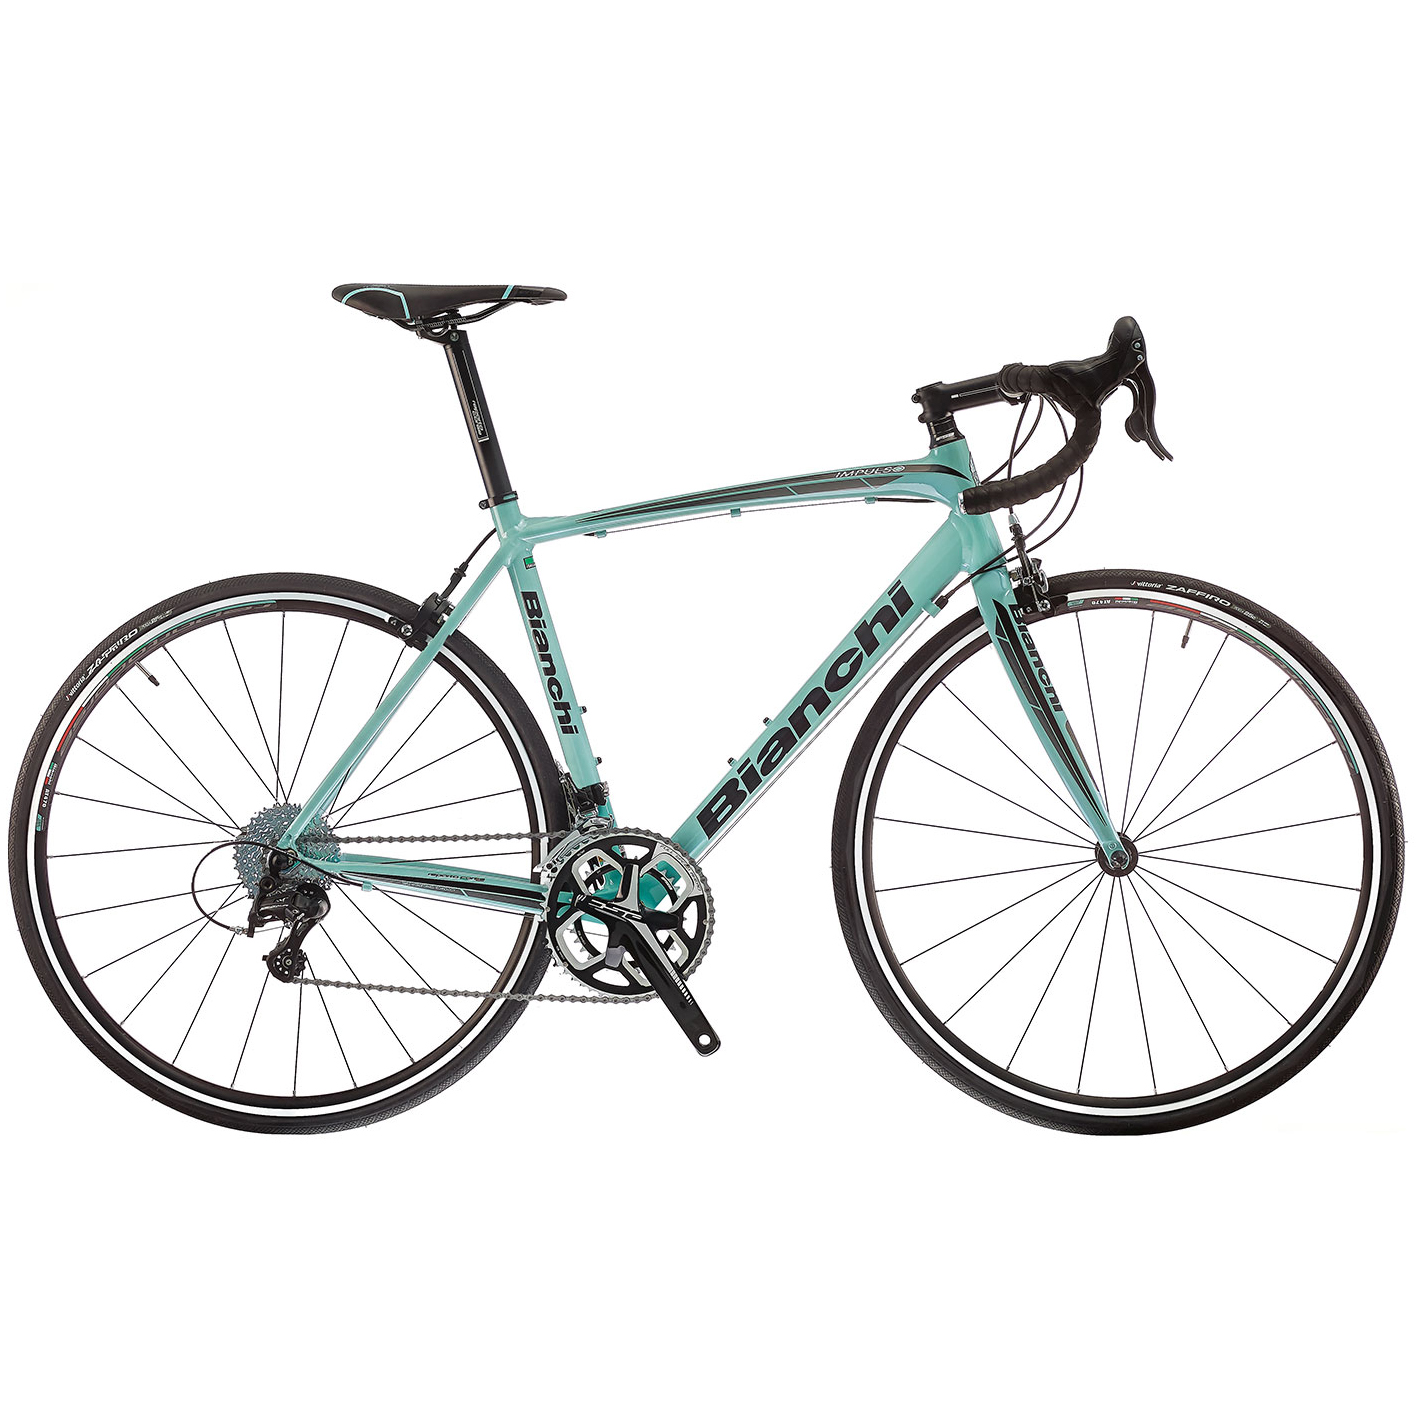 Bianchi Impulso Centaur Road Bike - 2018